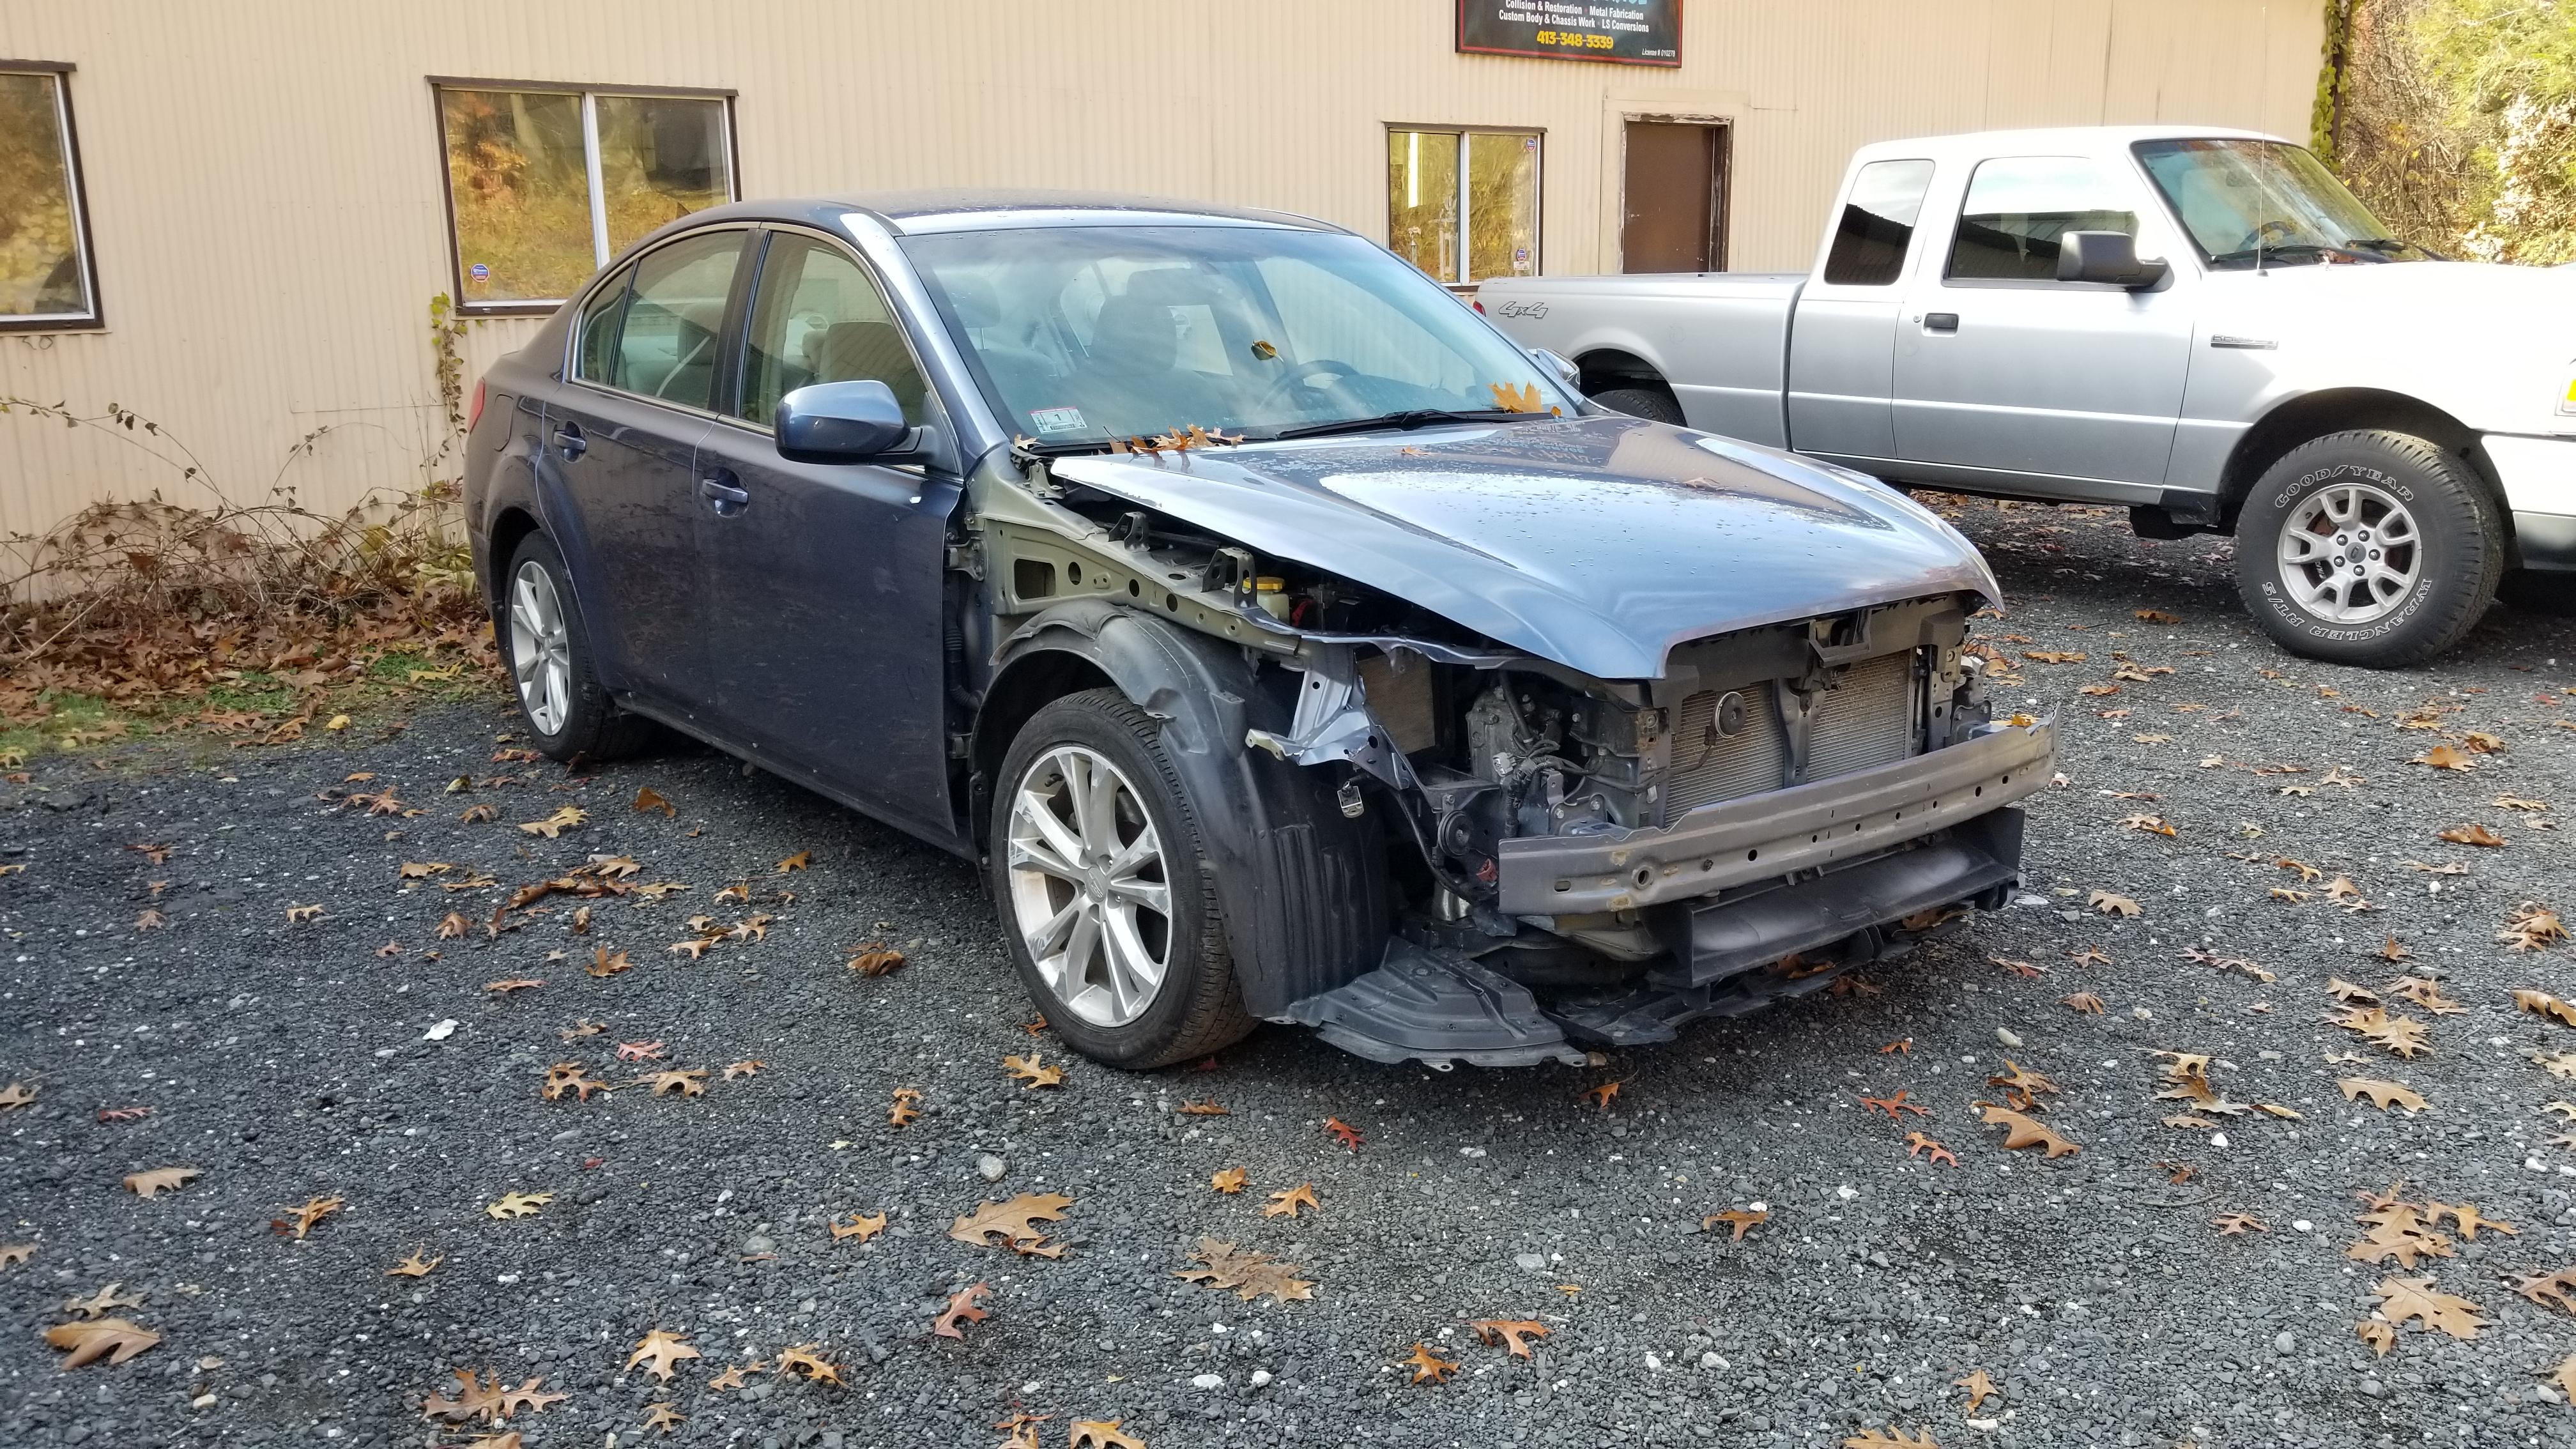 Auto Body Repair Rick Foy's Garage